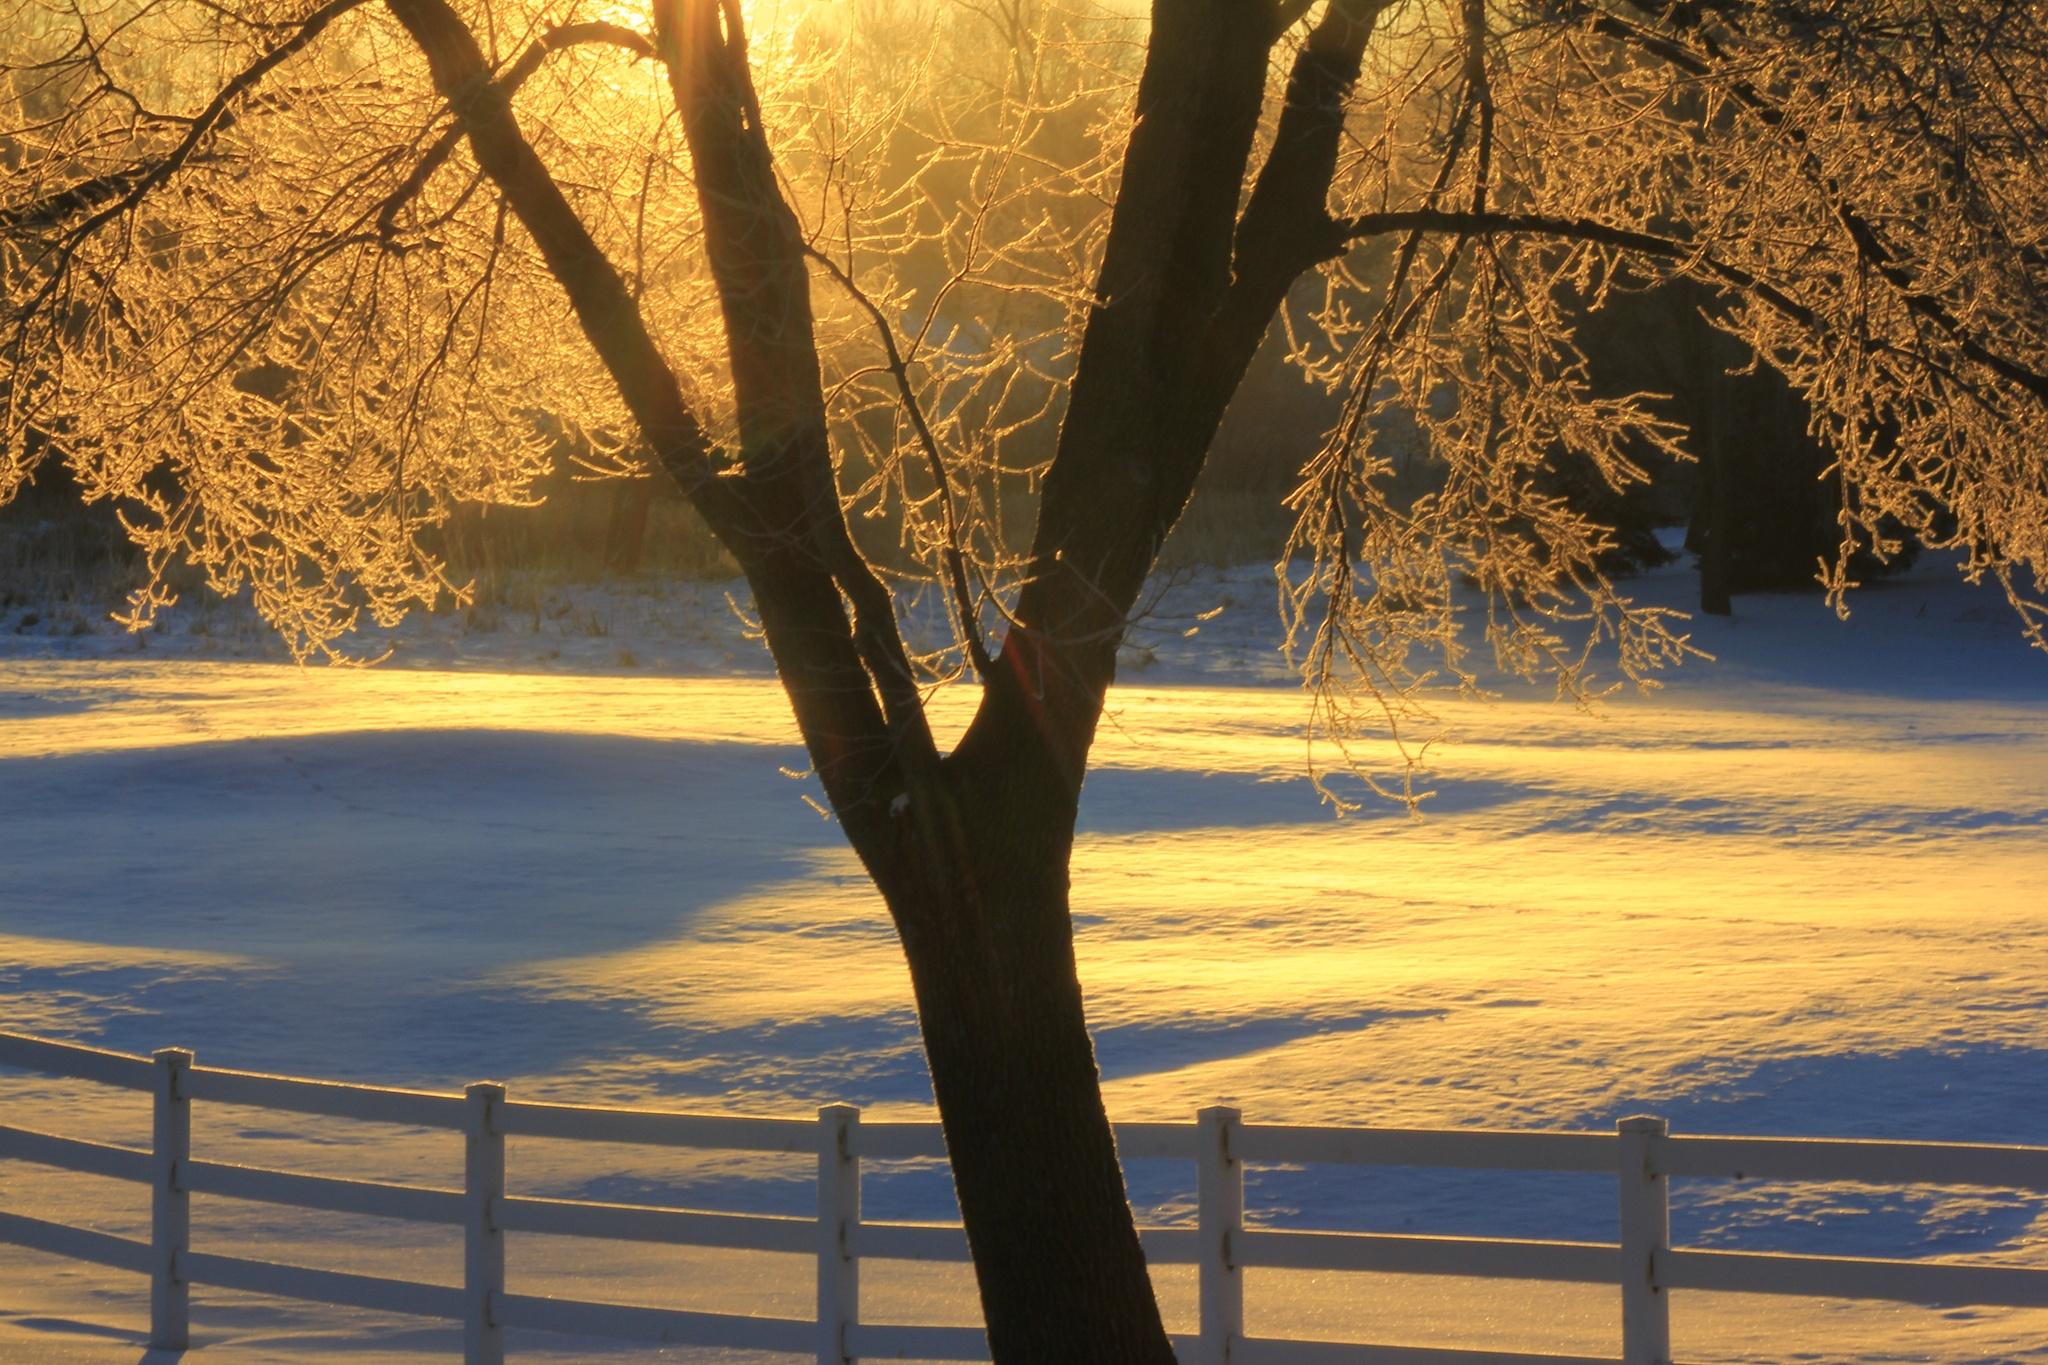 Golden snow by matthew.pastick